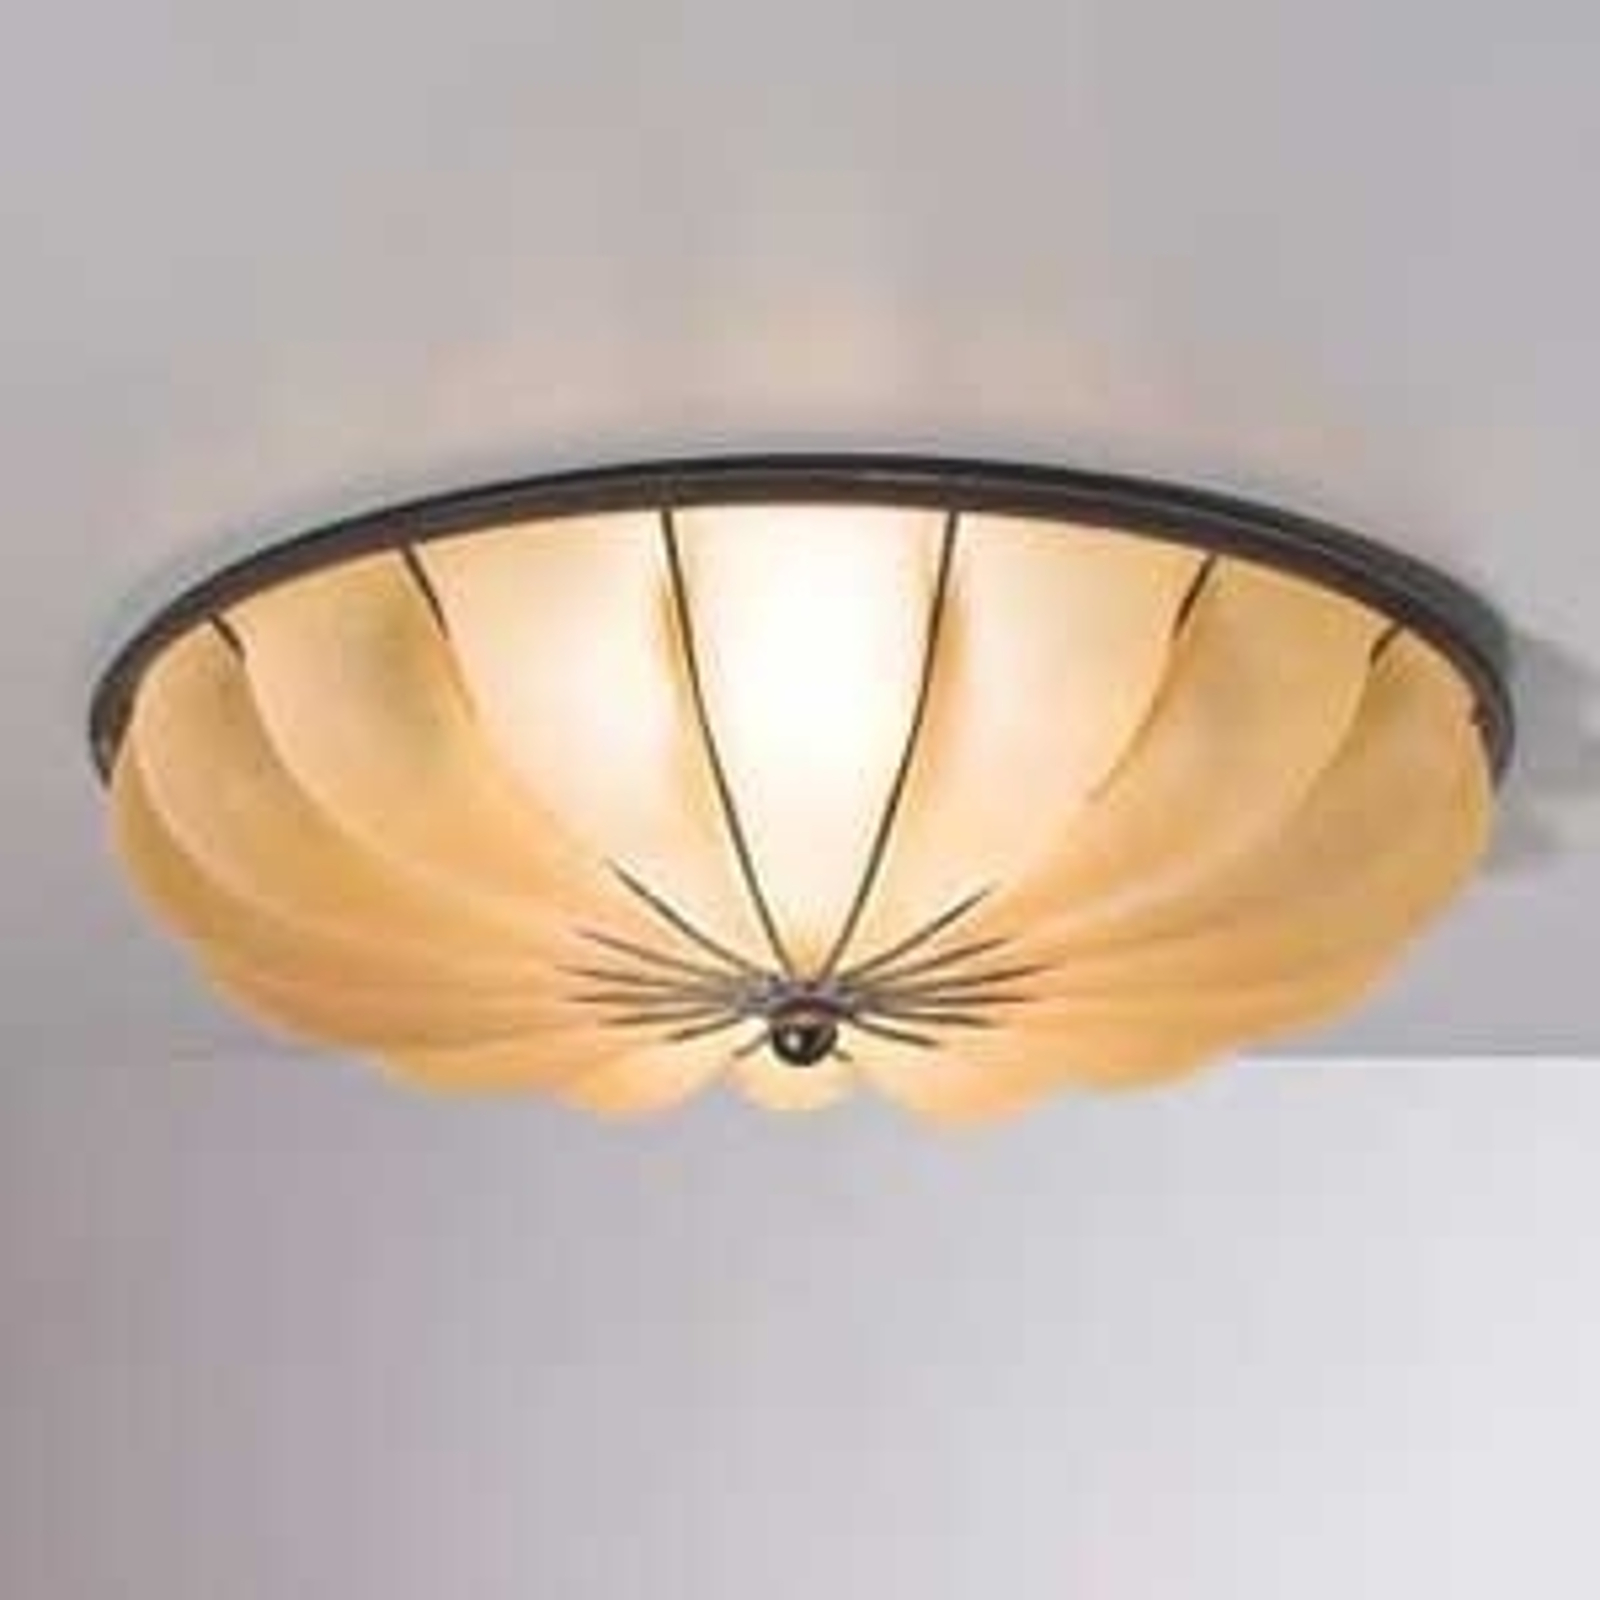 Halfronde plafondlamp RAGGIO, 40 cm